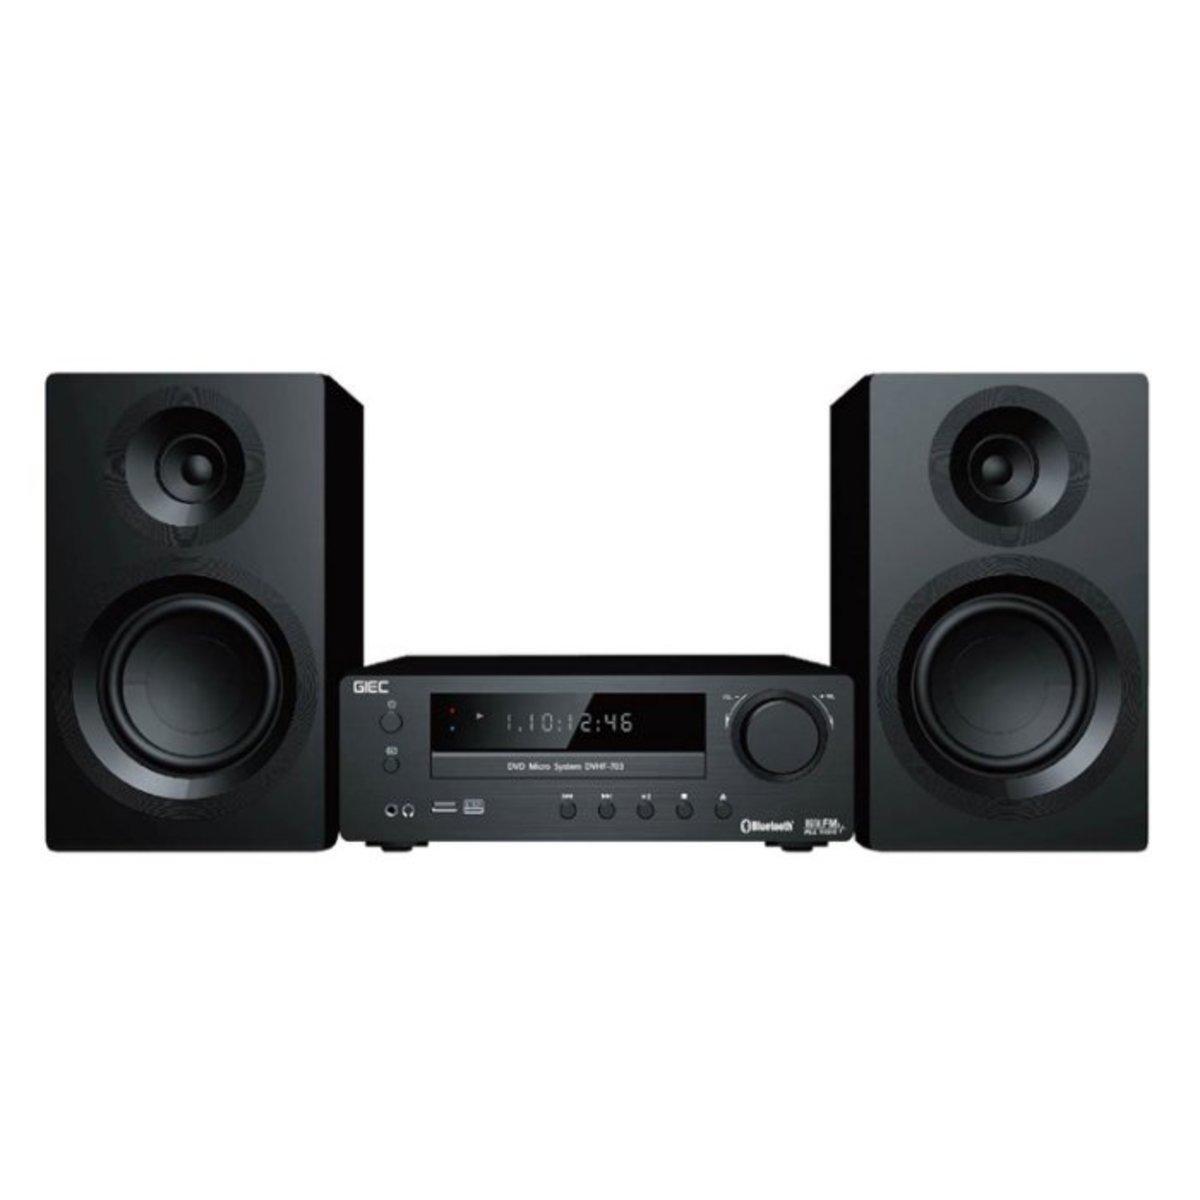 DVD Karaoke Sound Set DVHF703